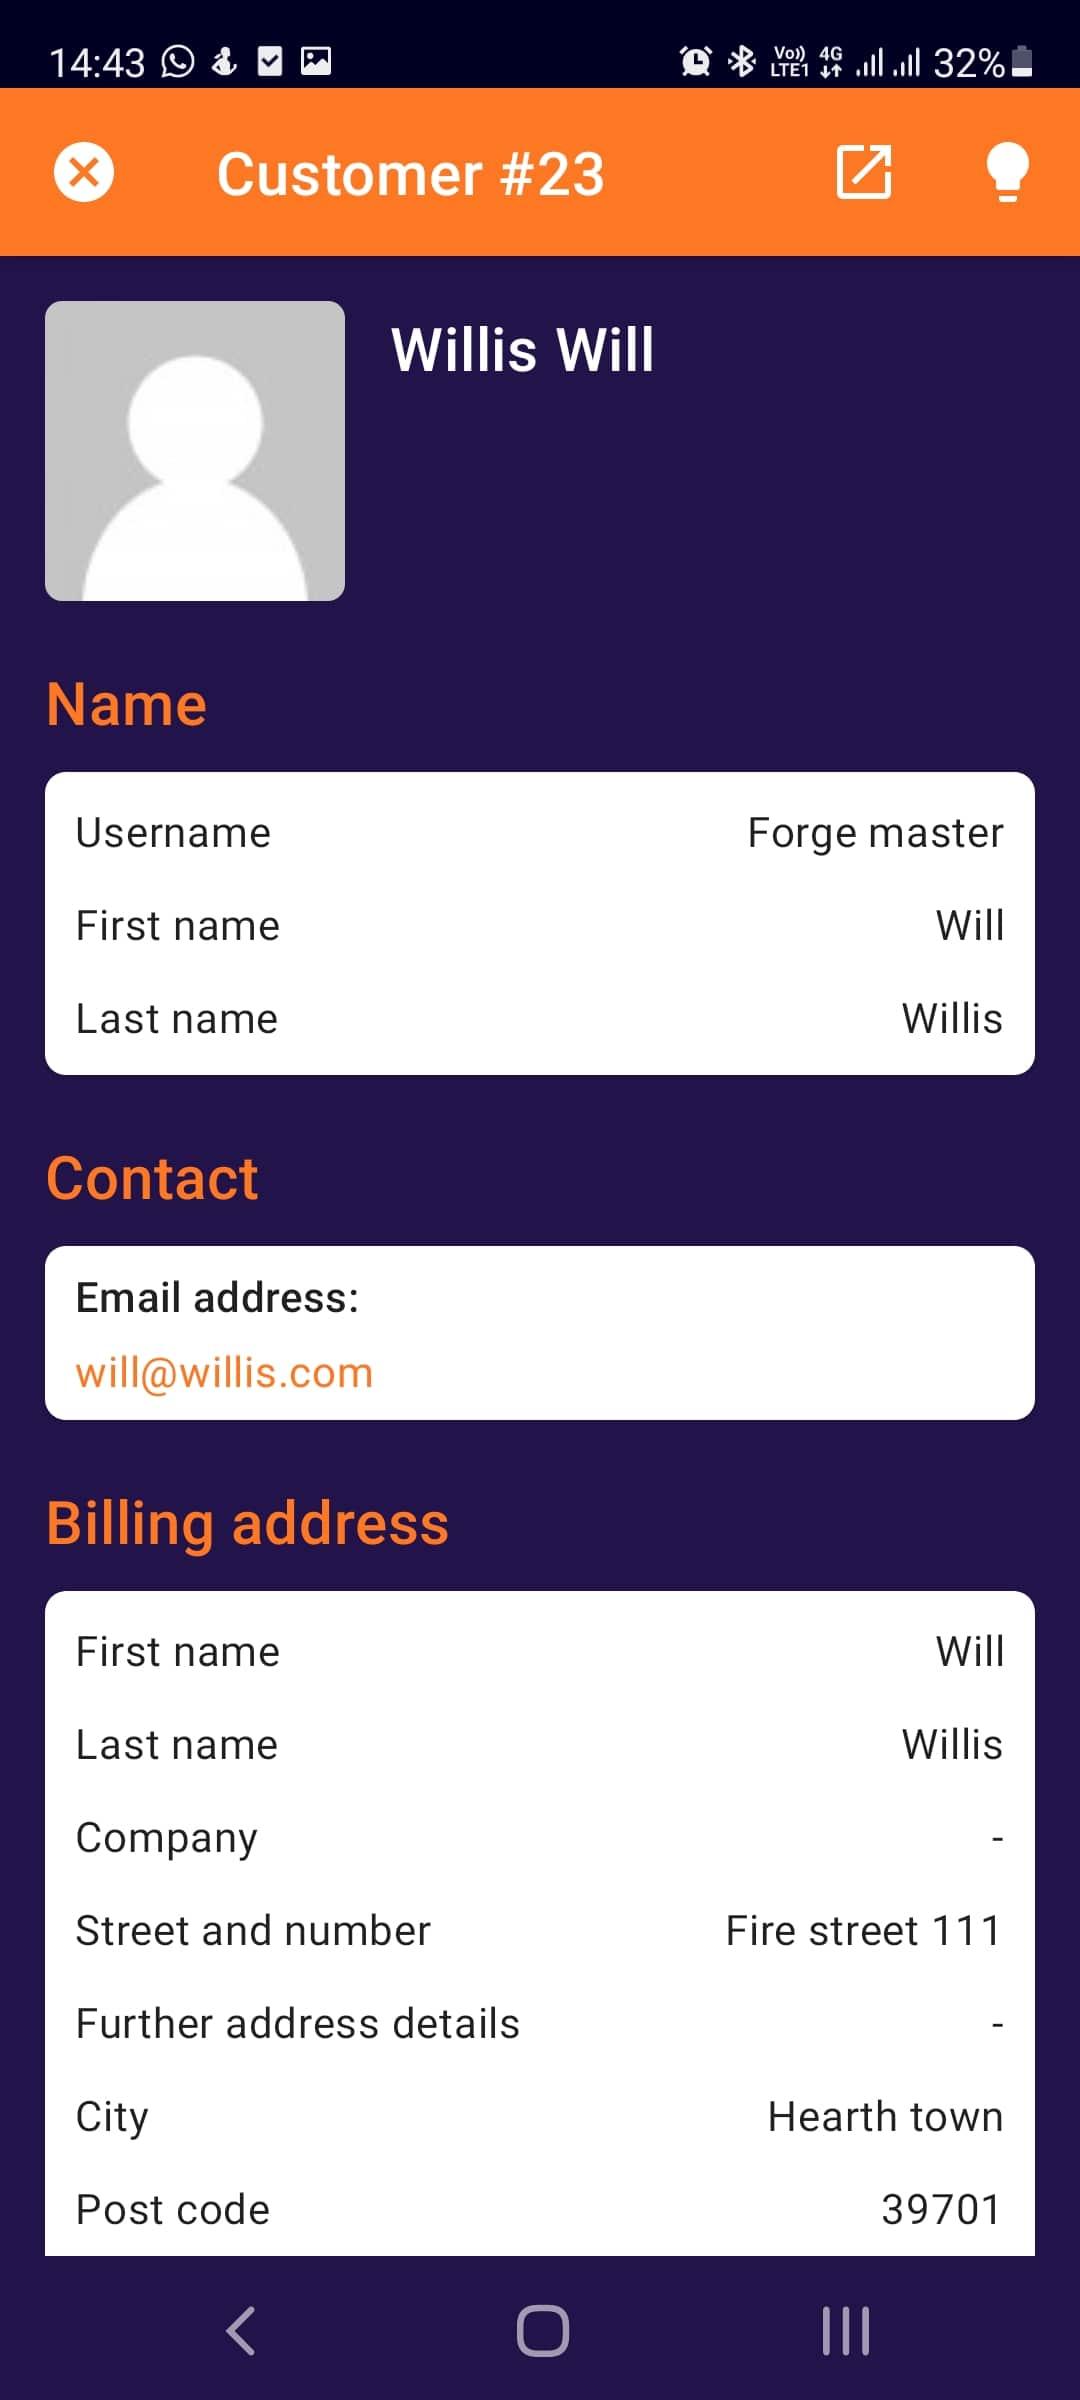 Toret WooCommerce Manager - customer detail (Light mode)